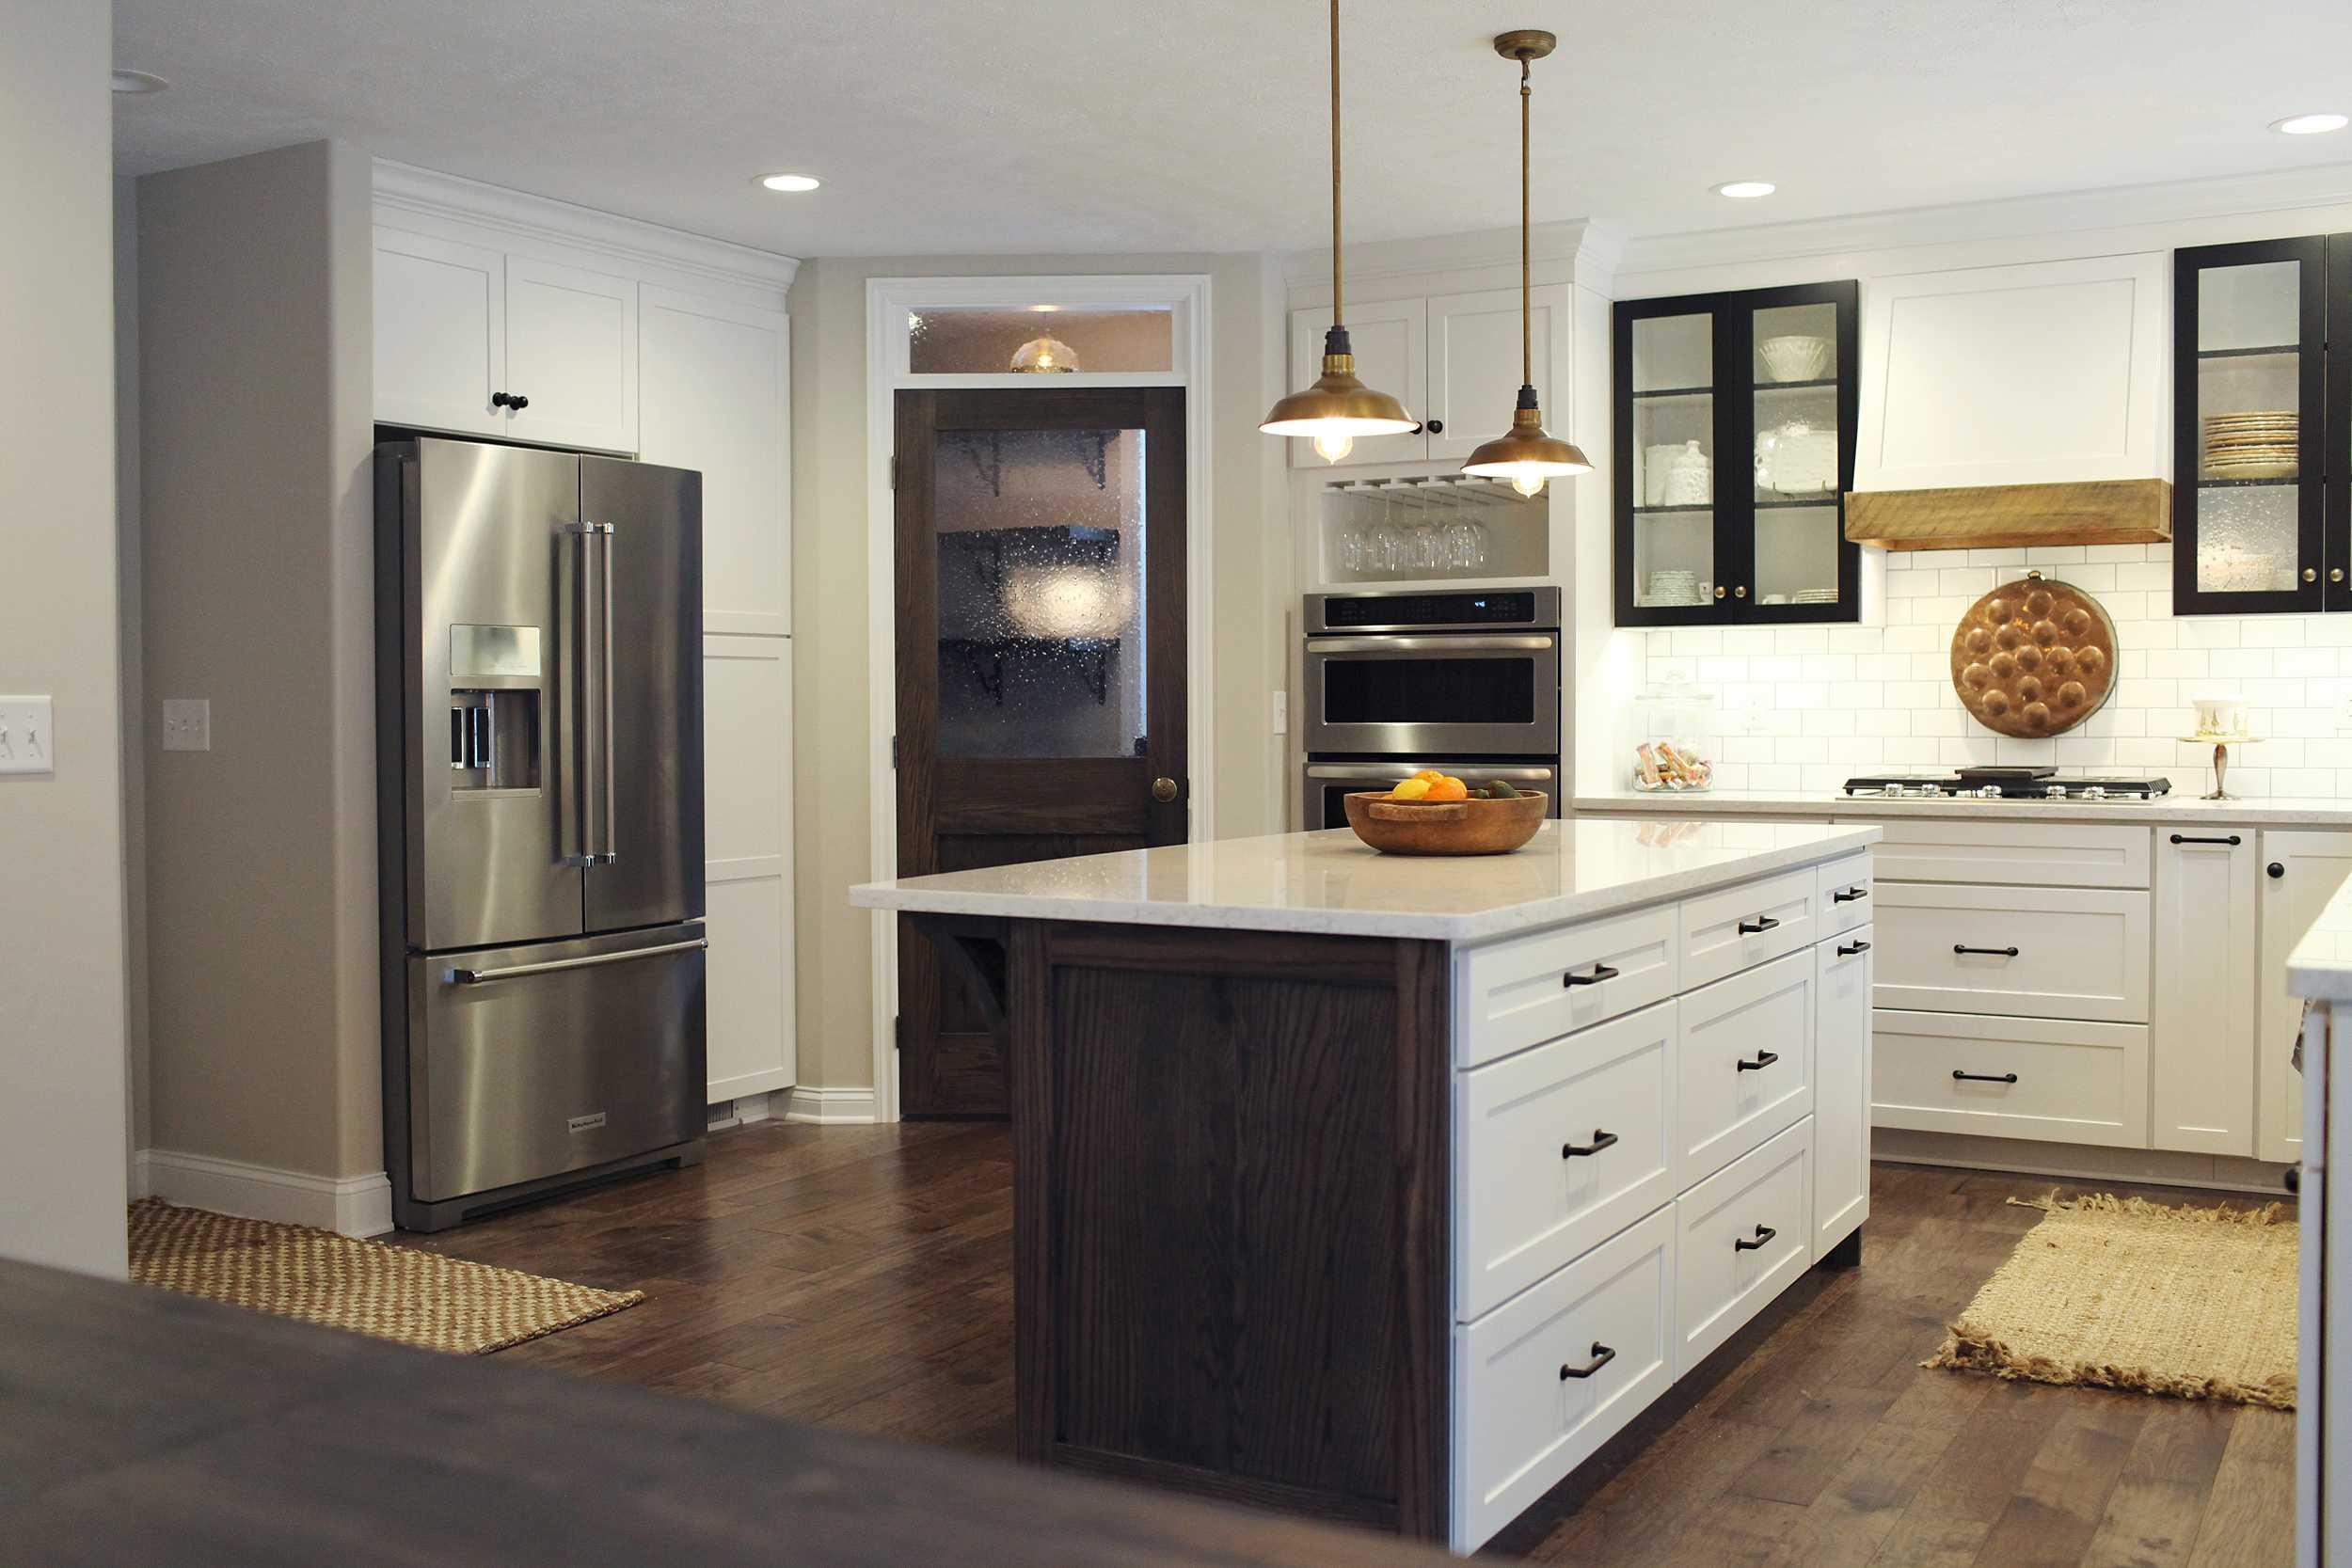 kitchen_remodel (2).jpg